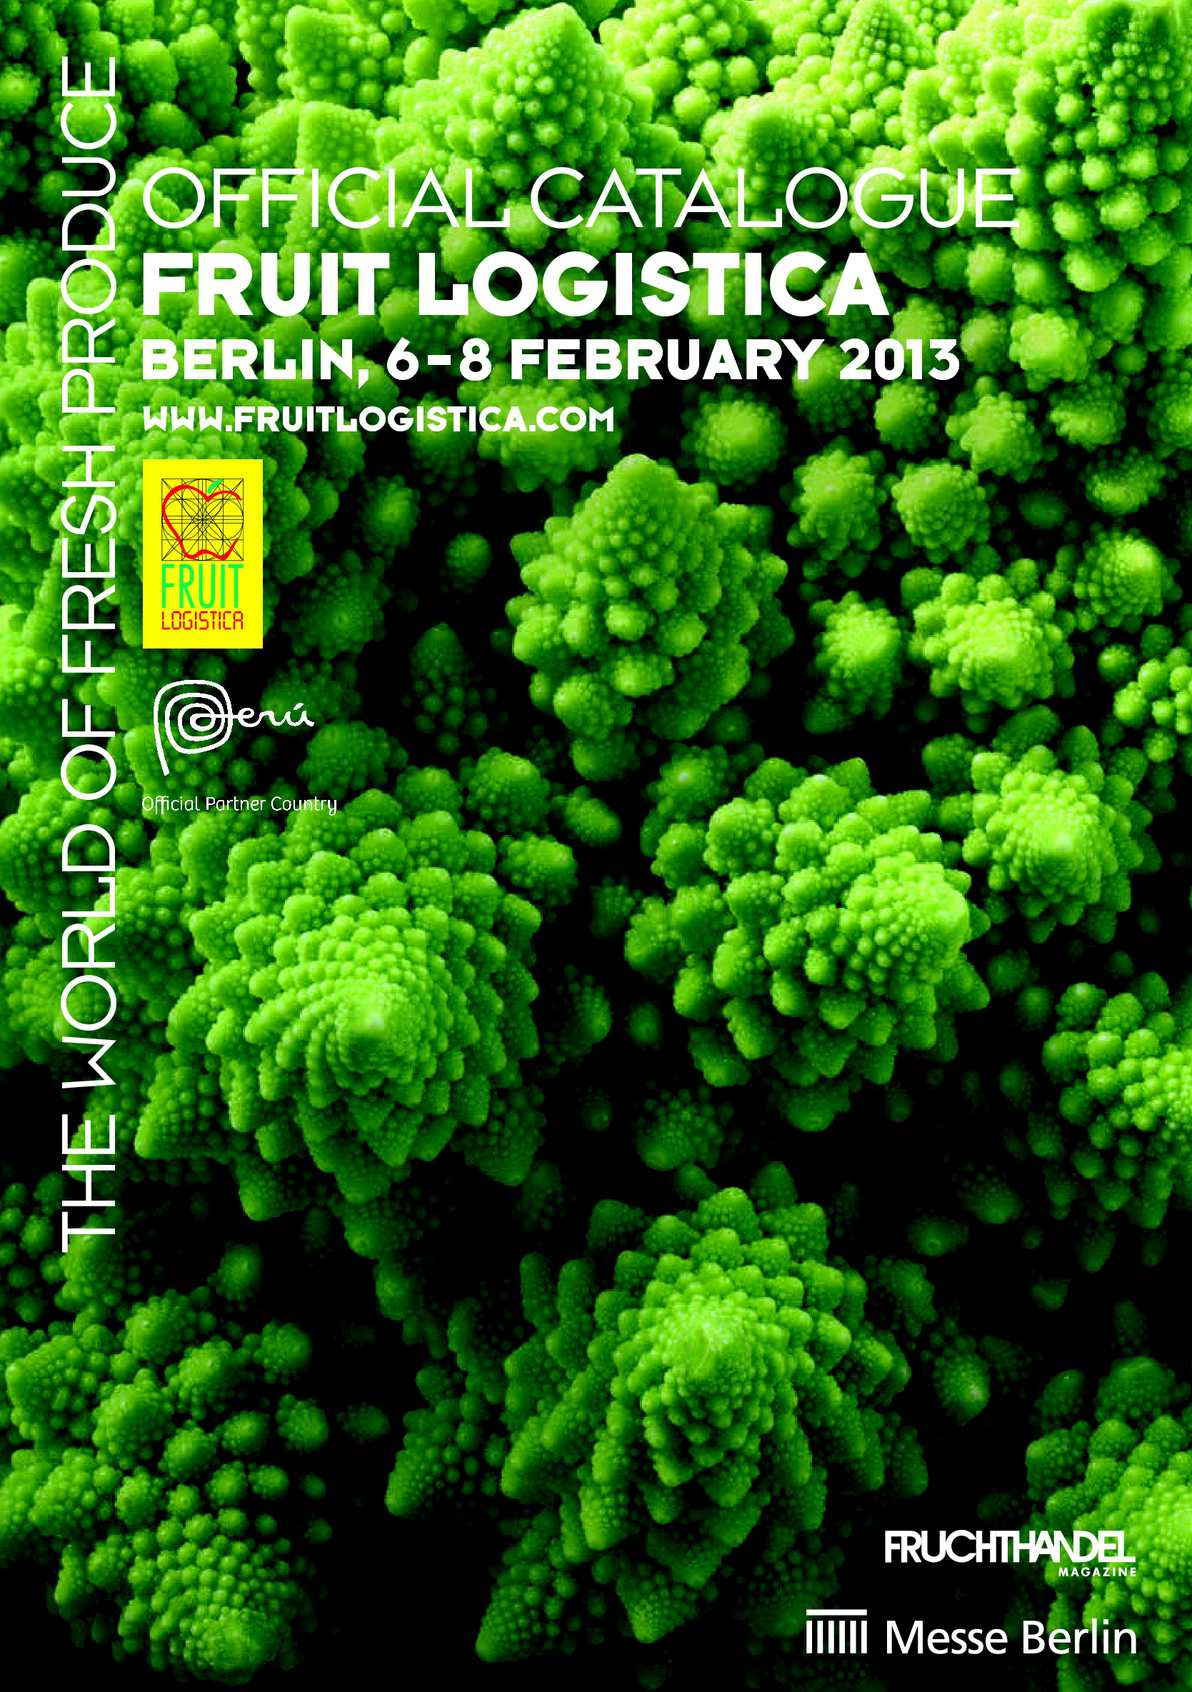 Calaméo Fruit Logistica 2013 Official Catalogue